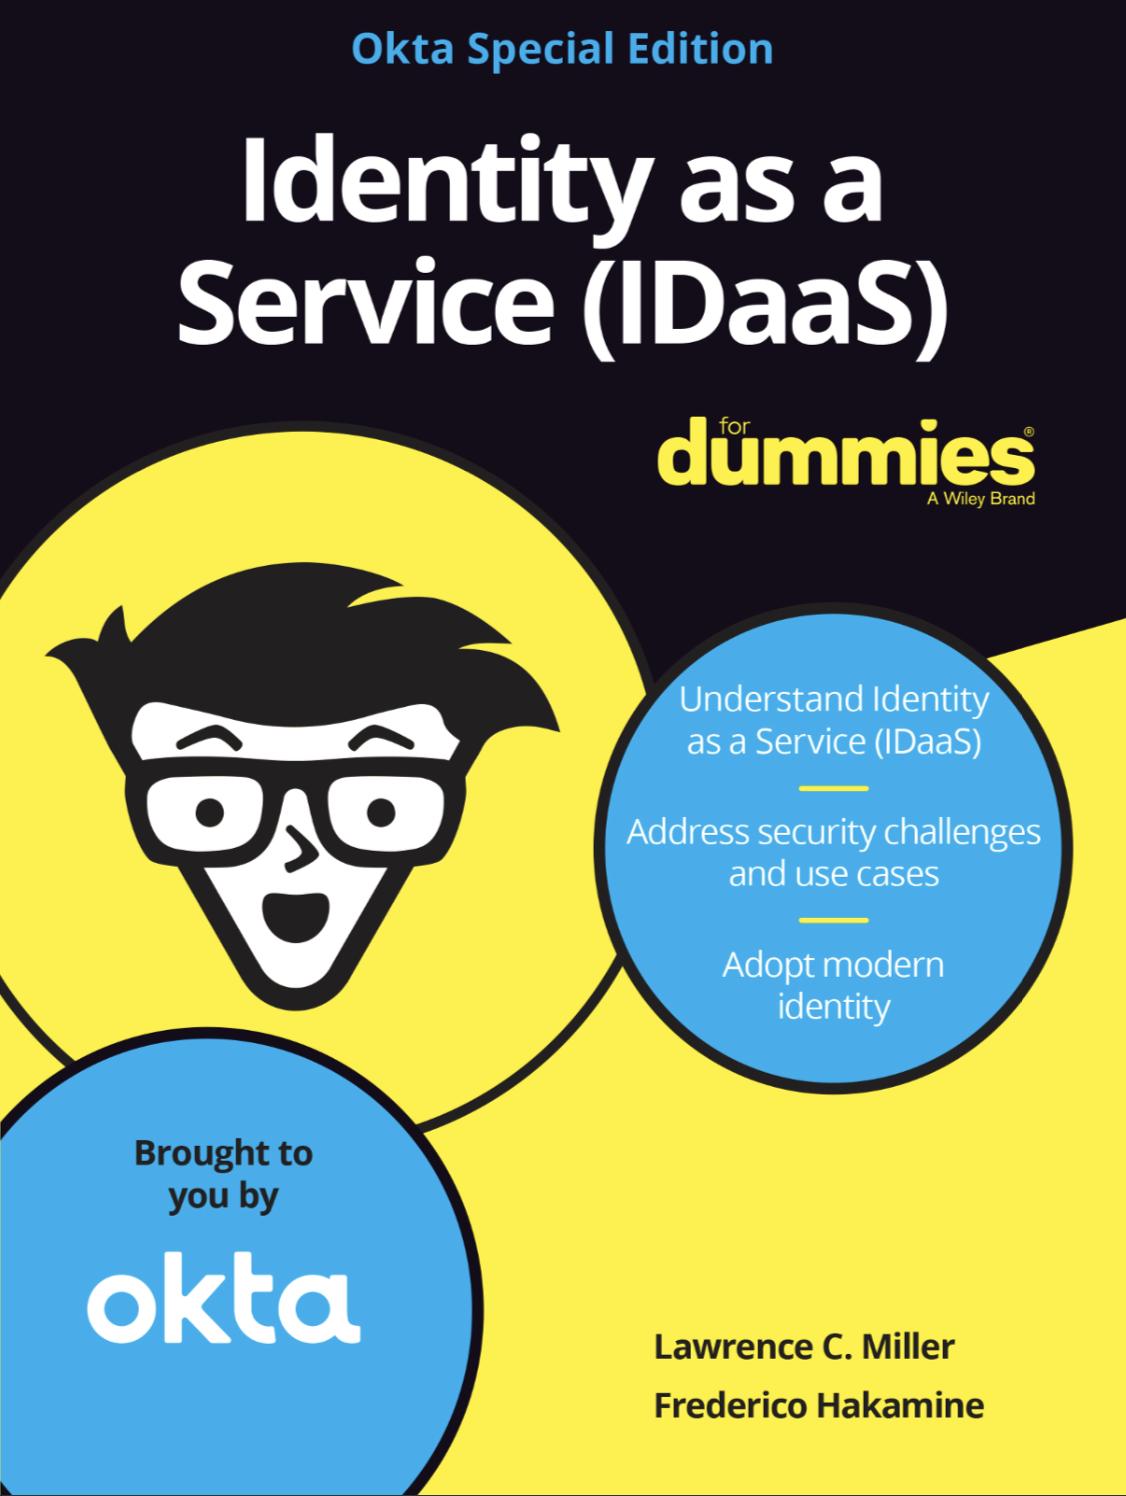 Identity as a Service (IDaaS) for Dummies